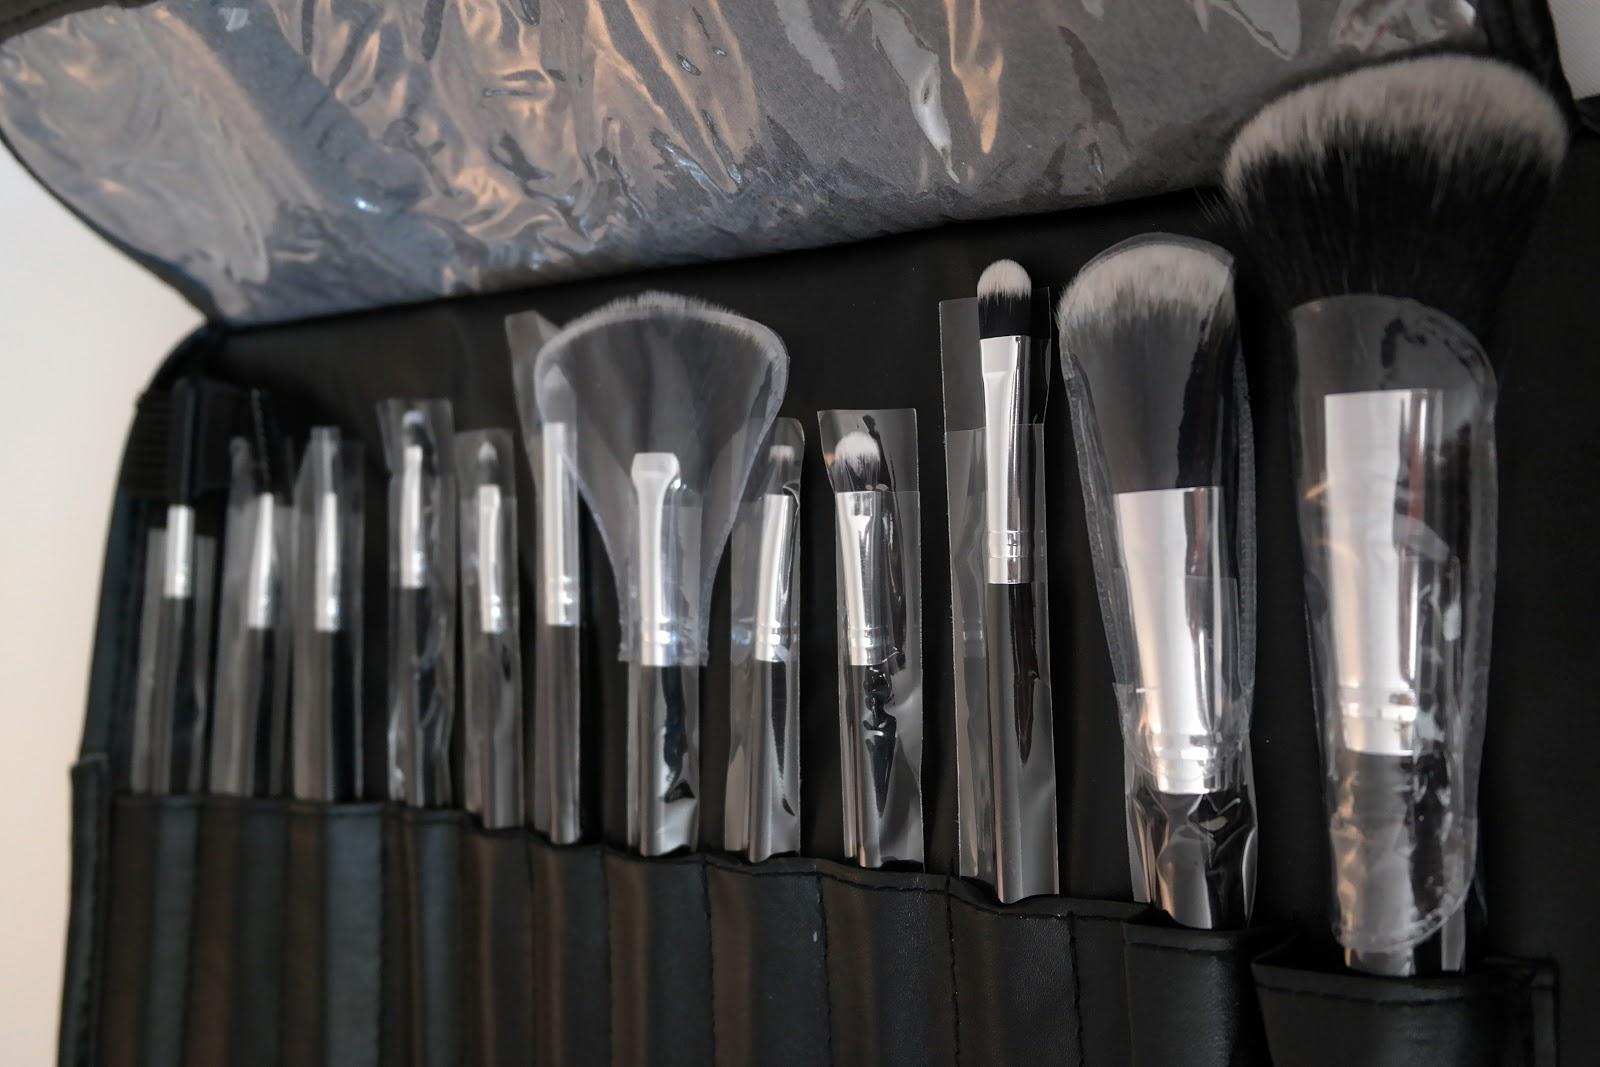 bh cosmetics 12 teiliges pinsel set classic test und liebe. Black Bedroom Furniture Sets. Home Design Ideas